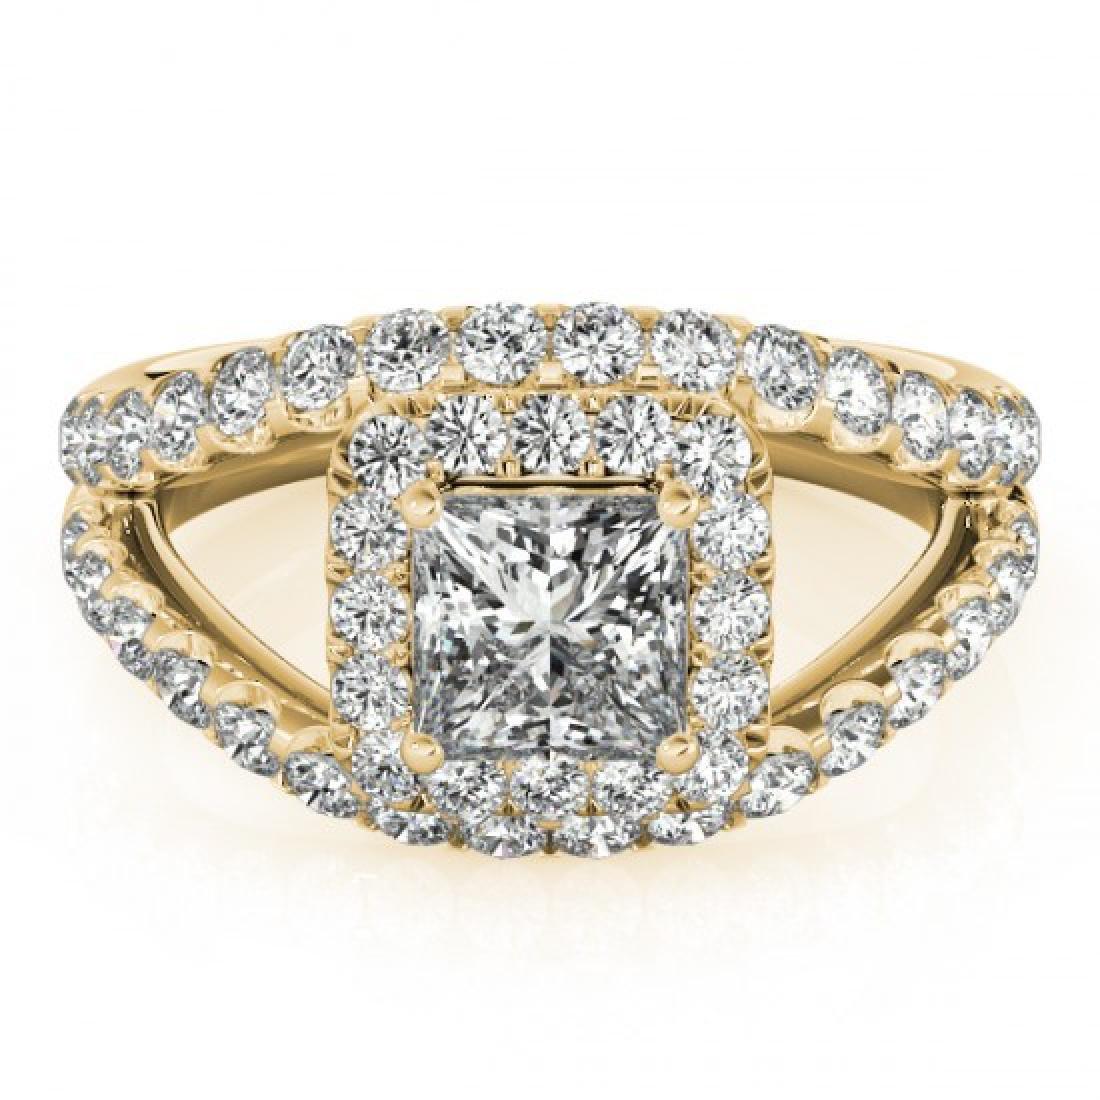 1.85 CTW Certified VS/SI Princess Diamond Solitaire